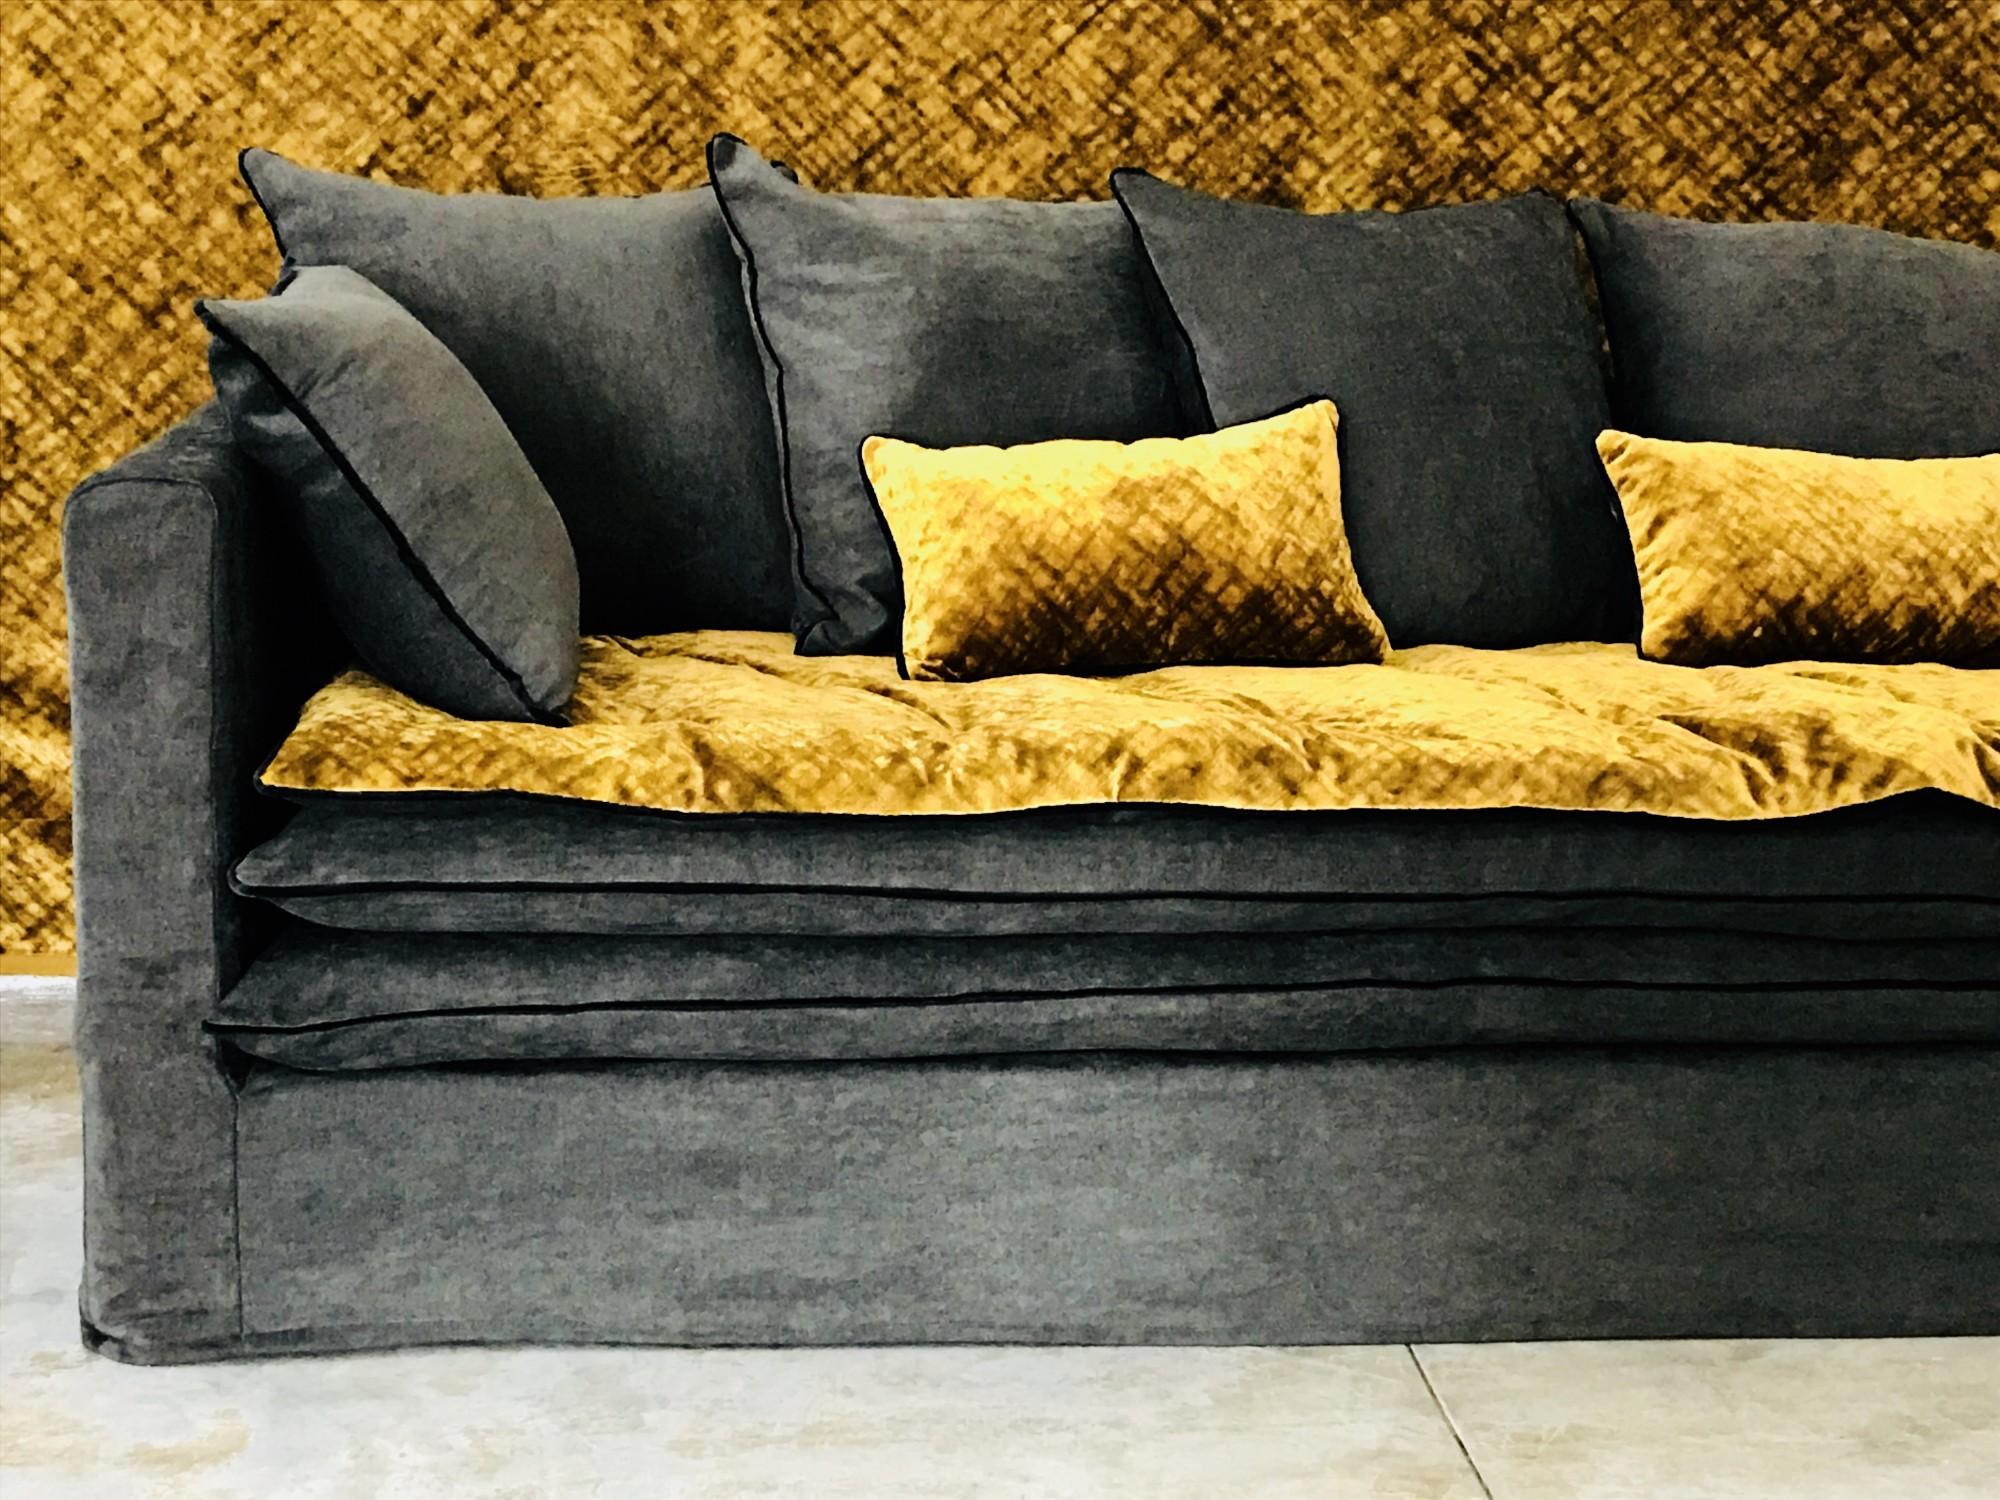 canap boheme en lin lav gris anthracite carbone. Black Bedroom Furniture Sets. Home Design Ideas